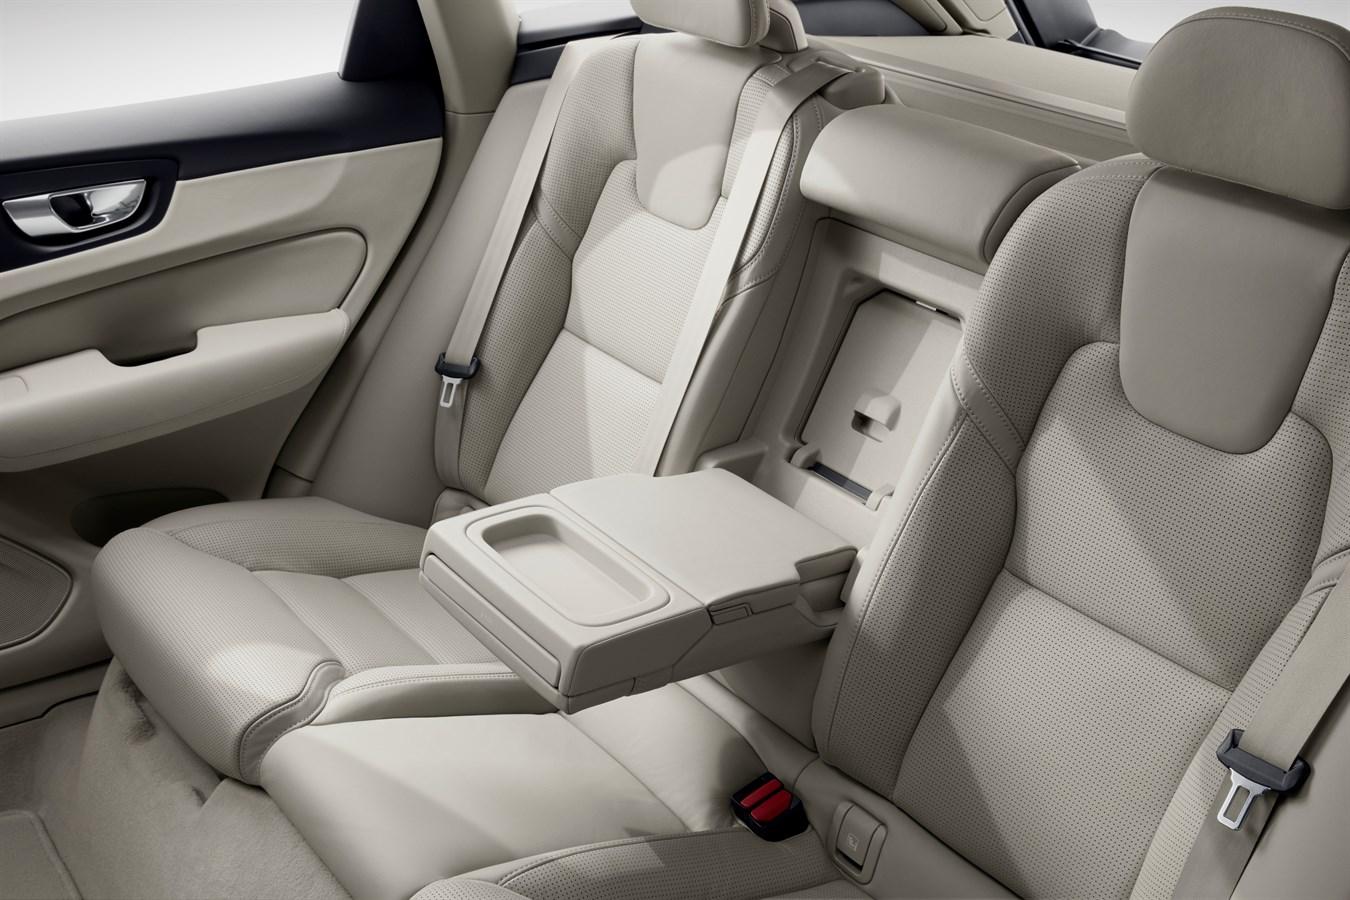 https://www.media.volvocars.com/image/low/205051/1_1/5